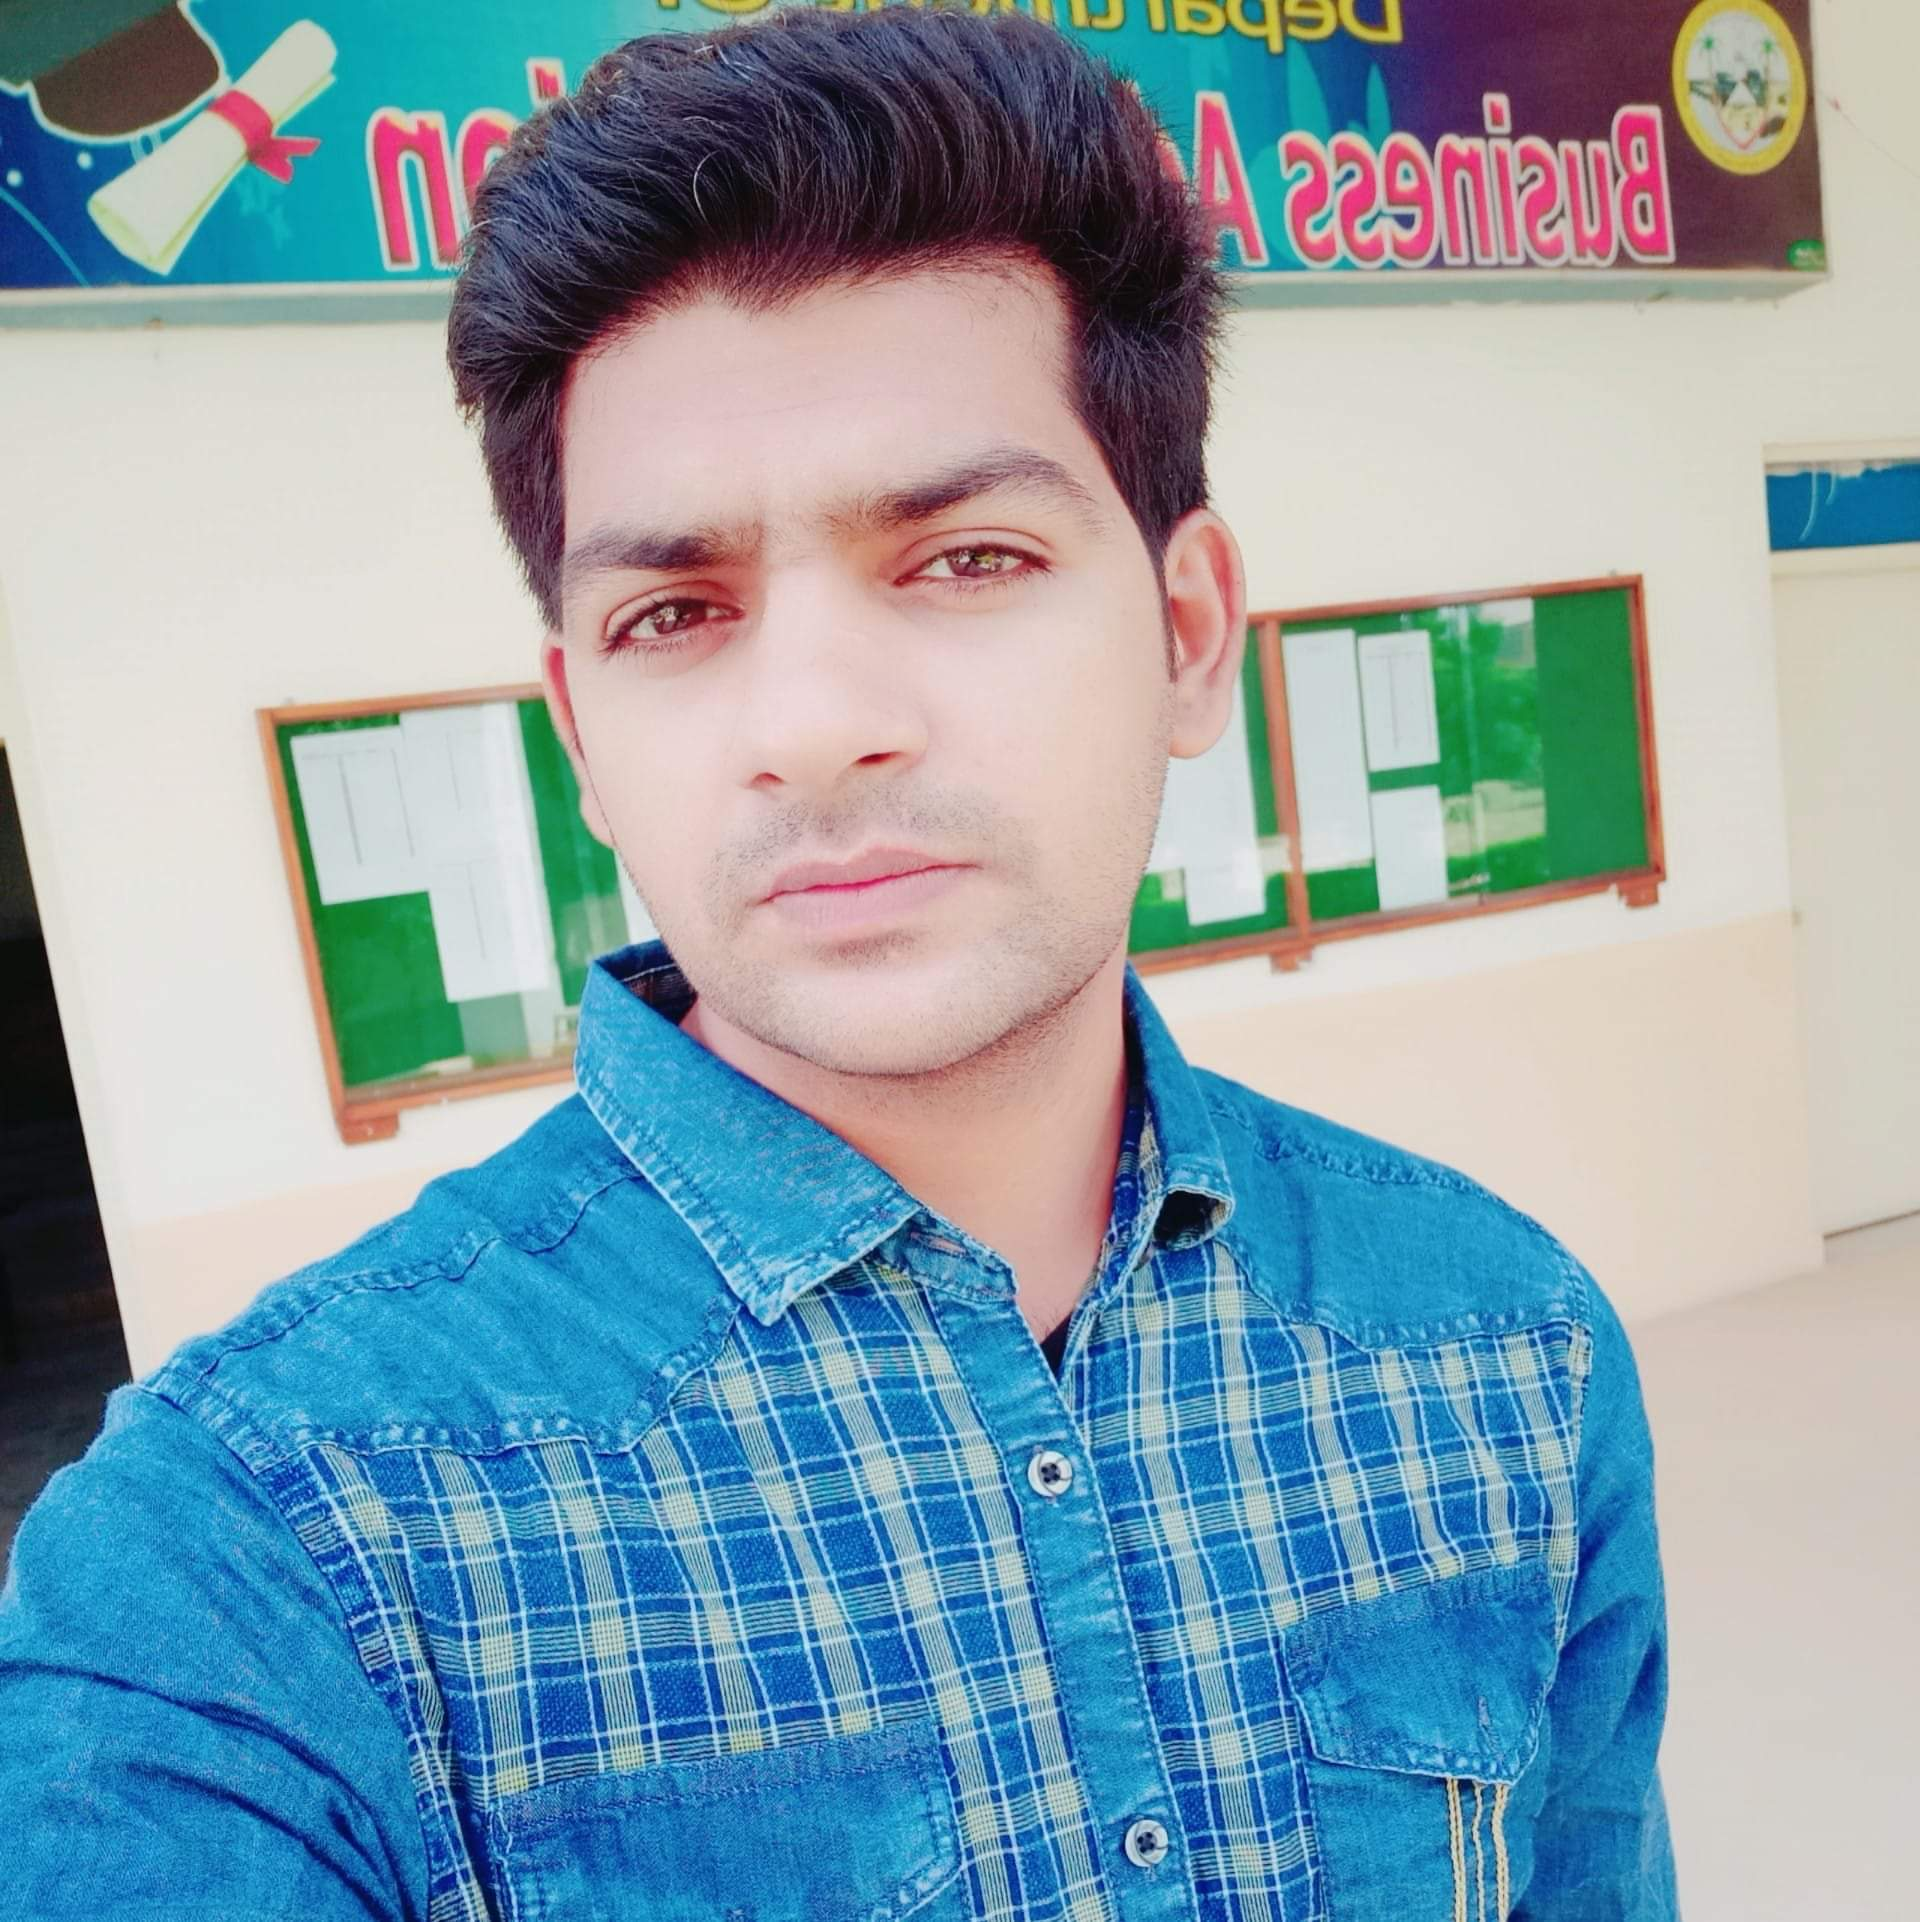 Mansoor Ali Accounting, Entrepreneurship, Finance, Human Resources, Project Management, Economics